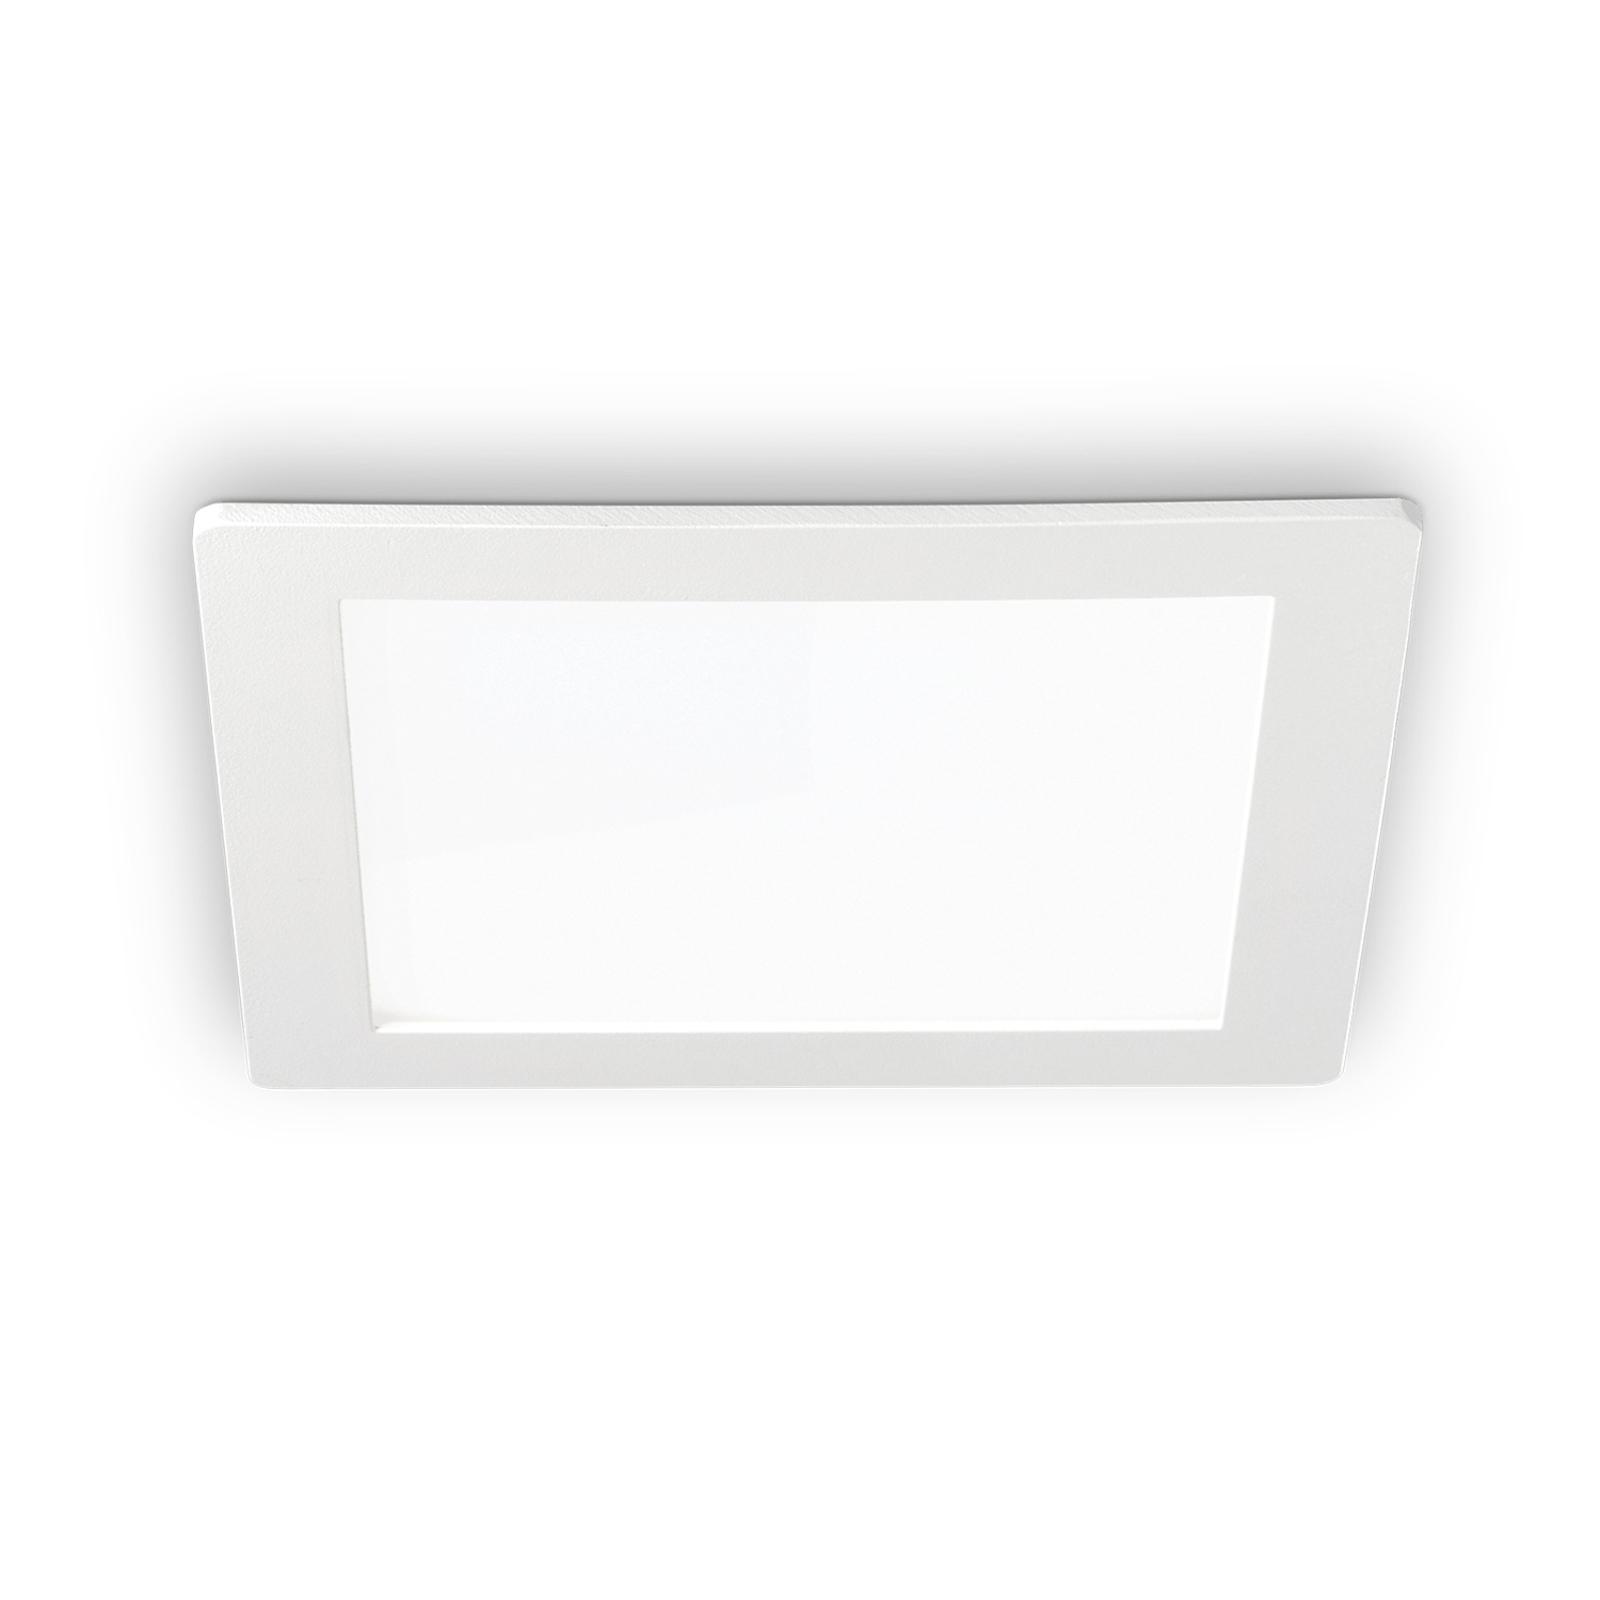 LED-Deckeneinbauleuchte Groove square 16,8x16,8 cm